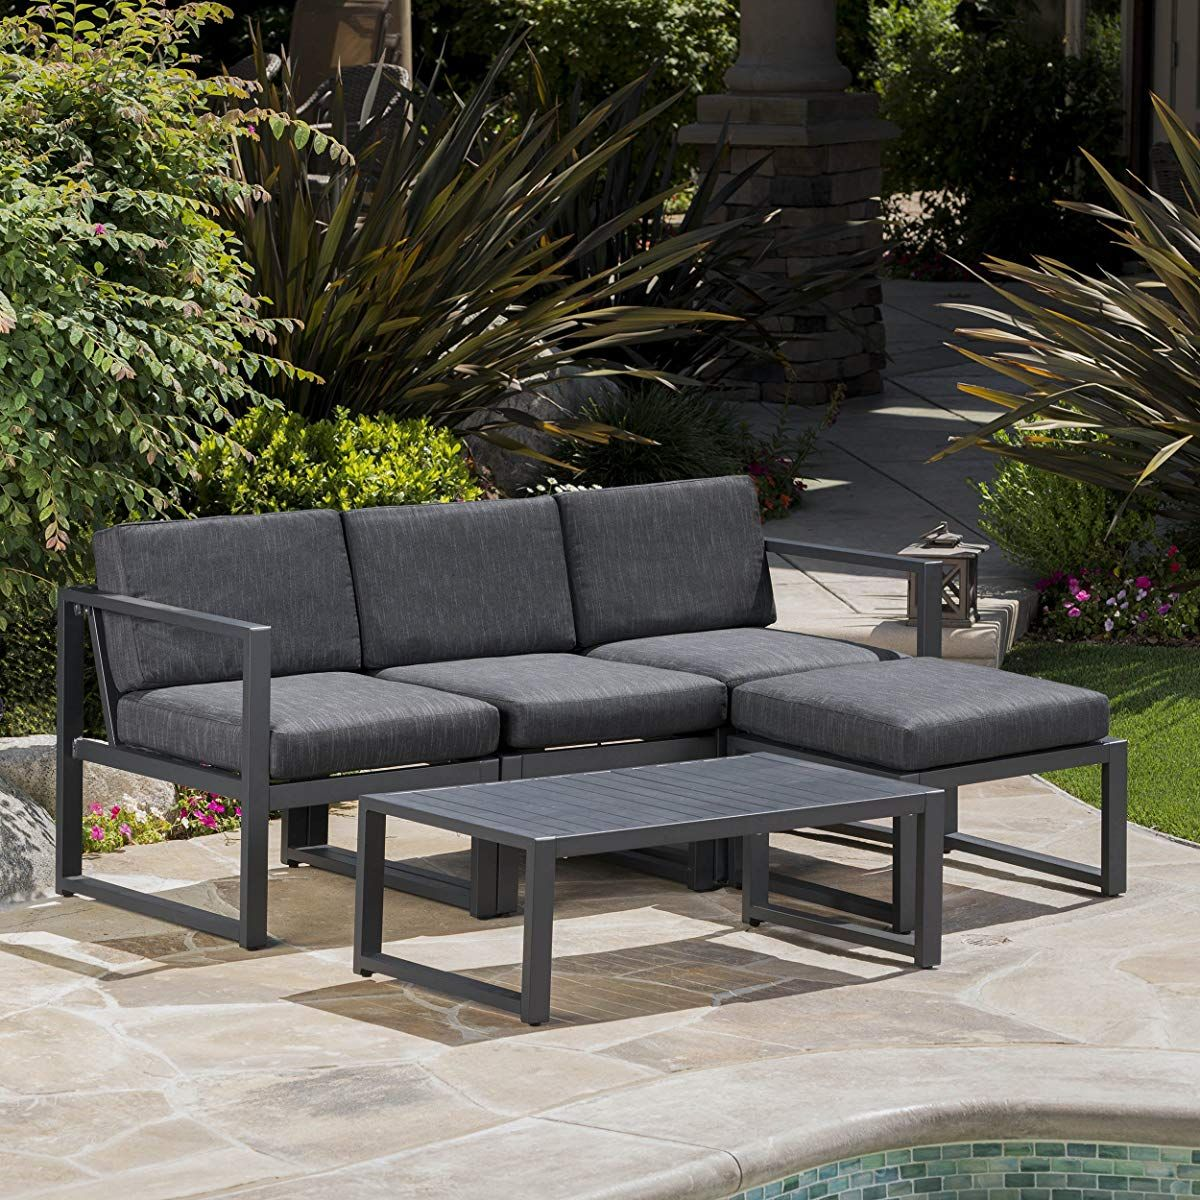 Nealie Patio Furniture 5 Piece Outdoor Aluminum Sofa Set Dark Grey Patio Furniture Sets Outdoor Seating Set Conversation Set Patio